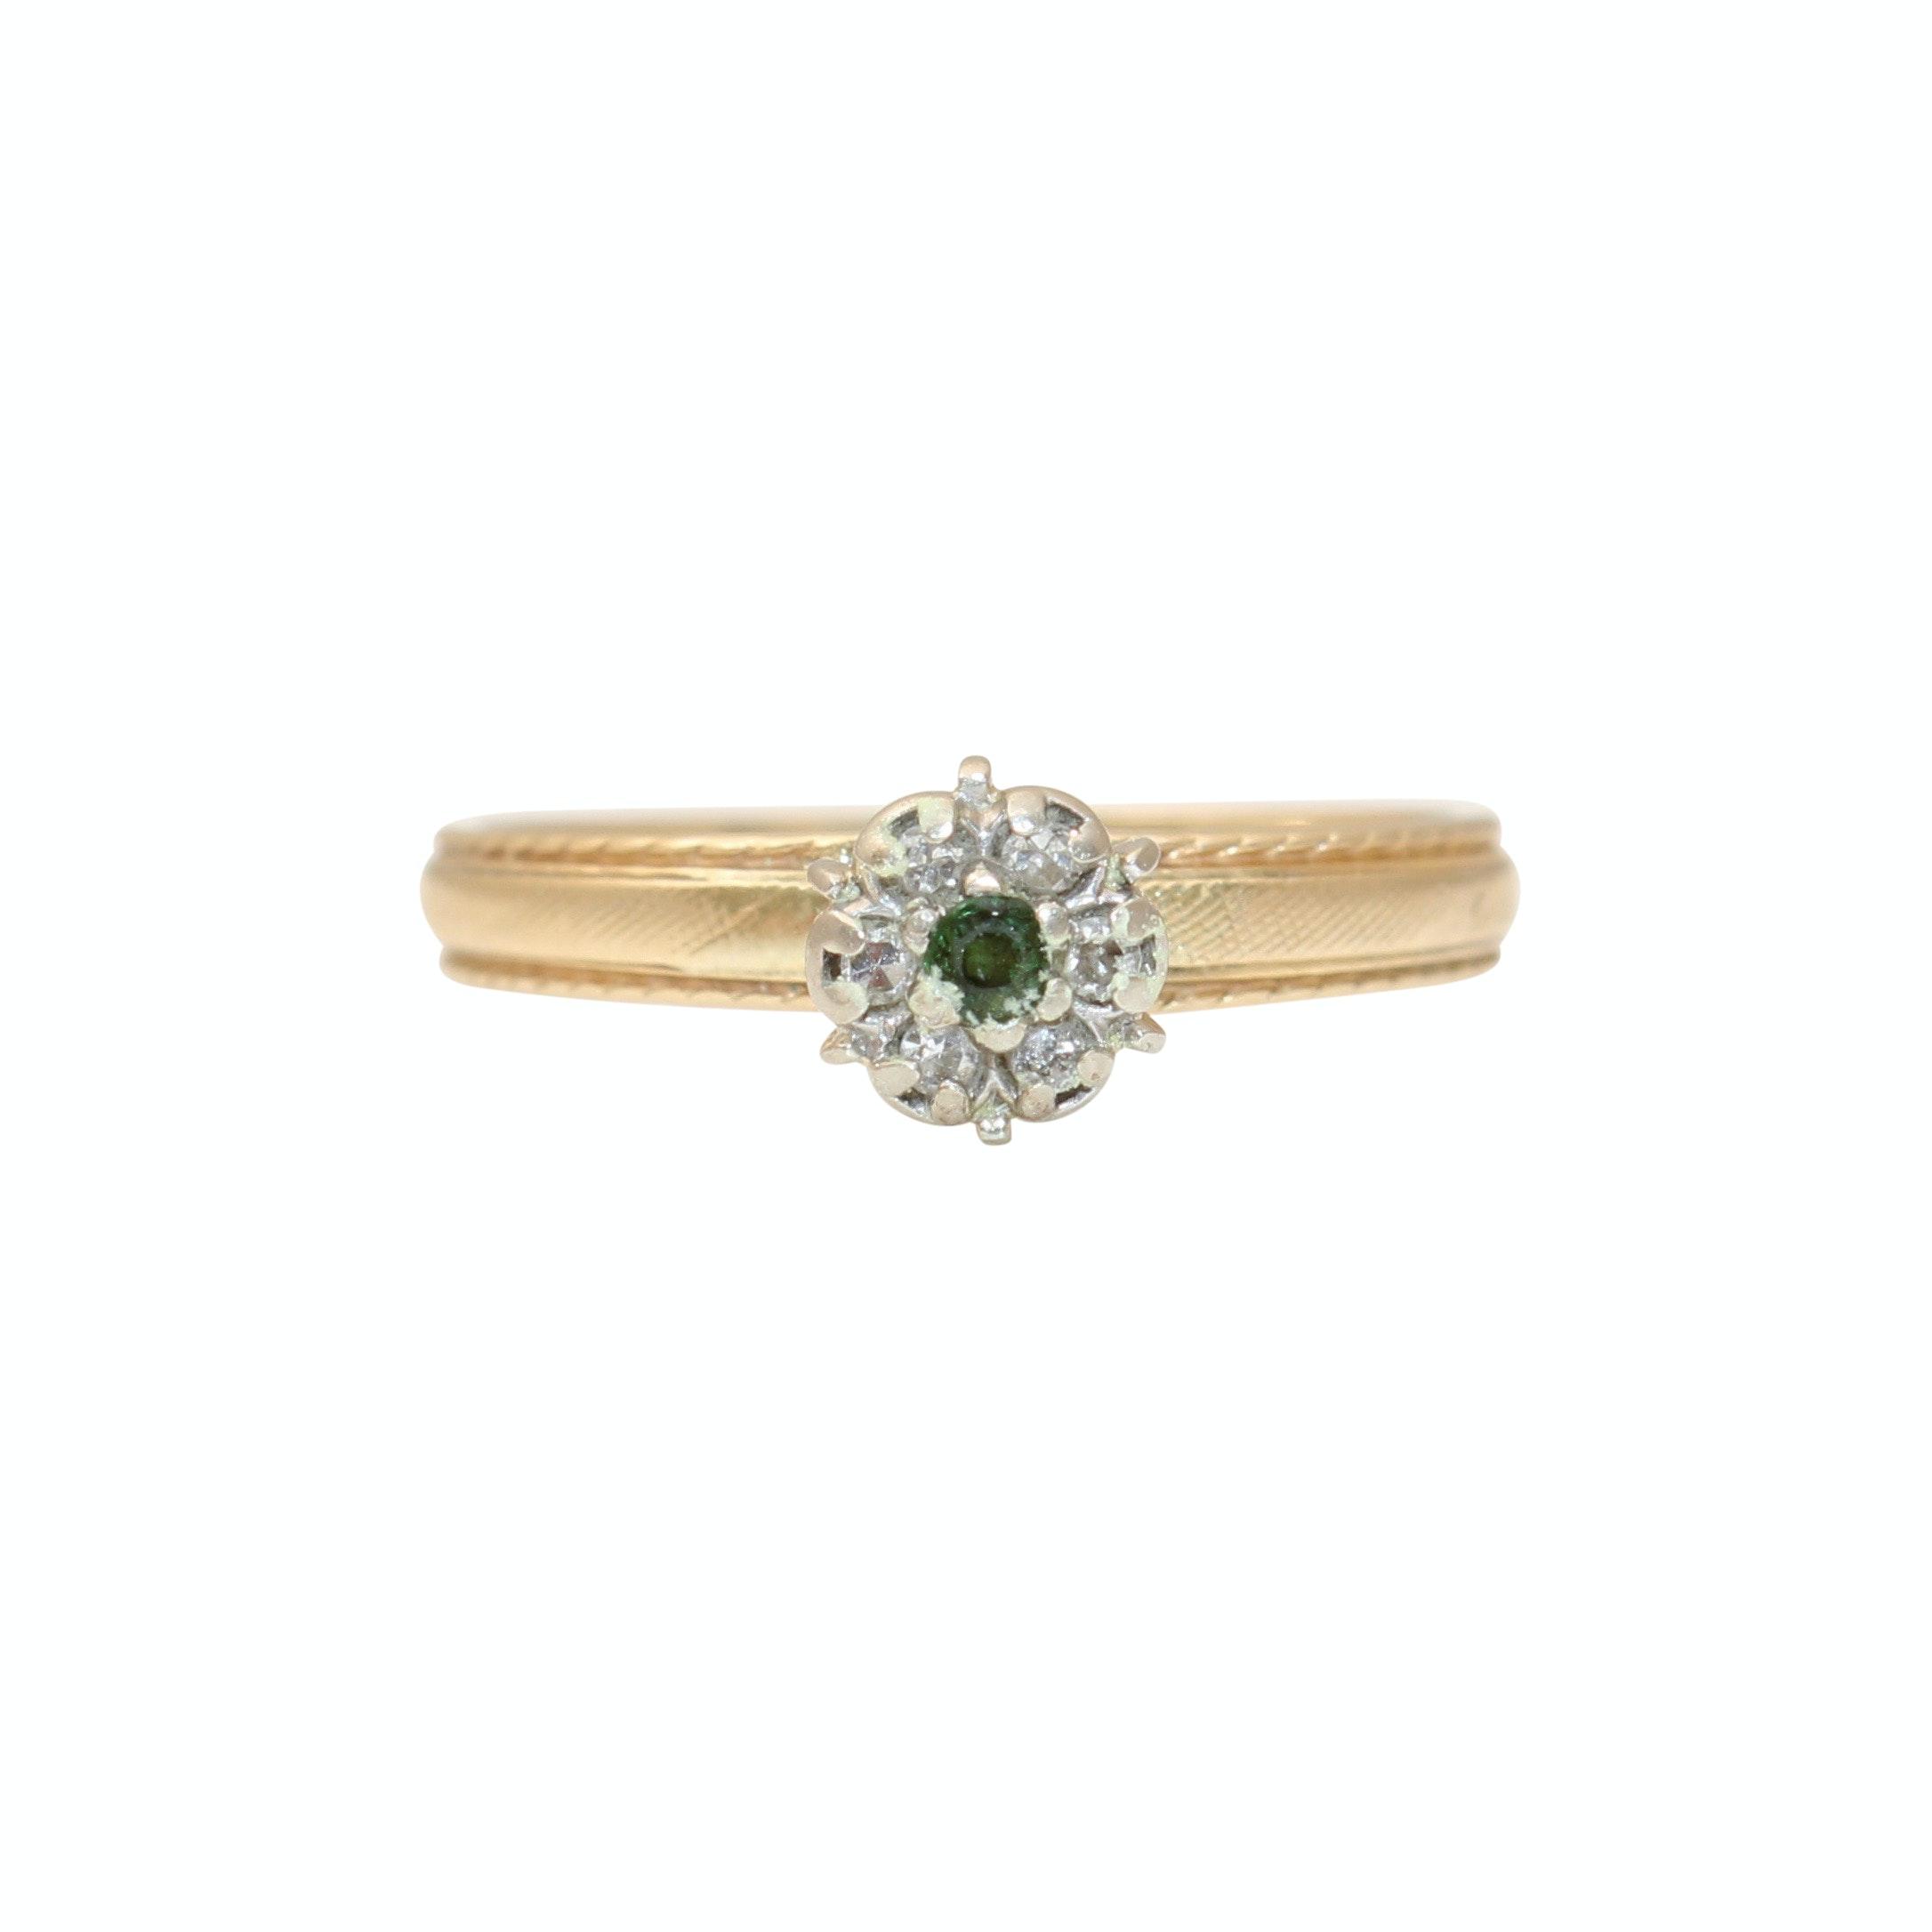 14K Yellow Gold Tourmaline And Diamond Ring